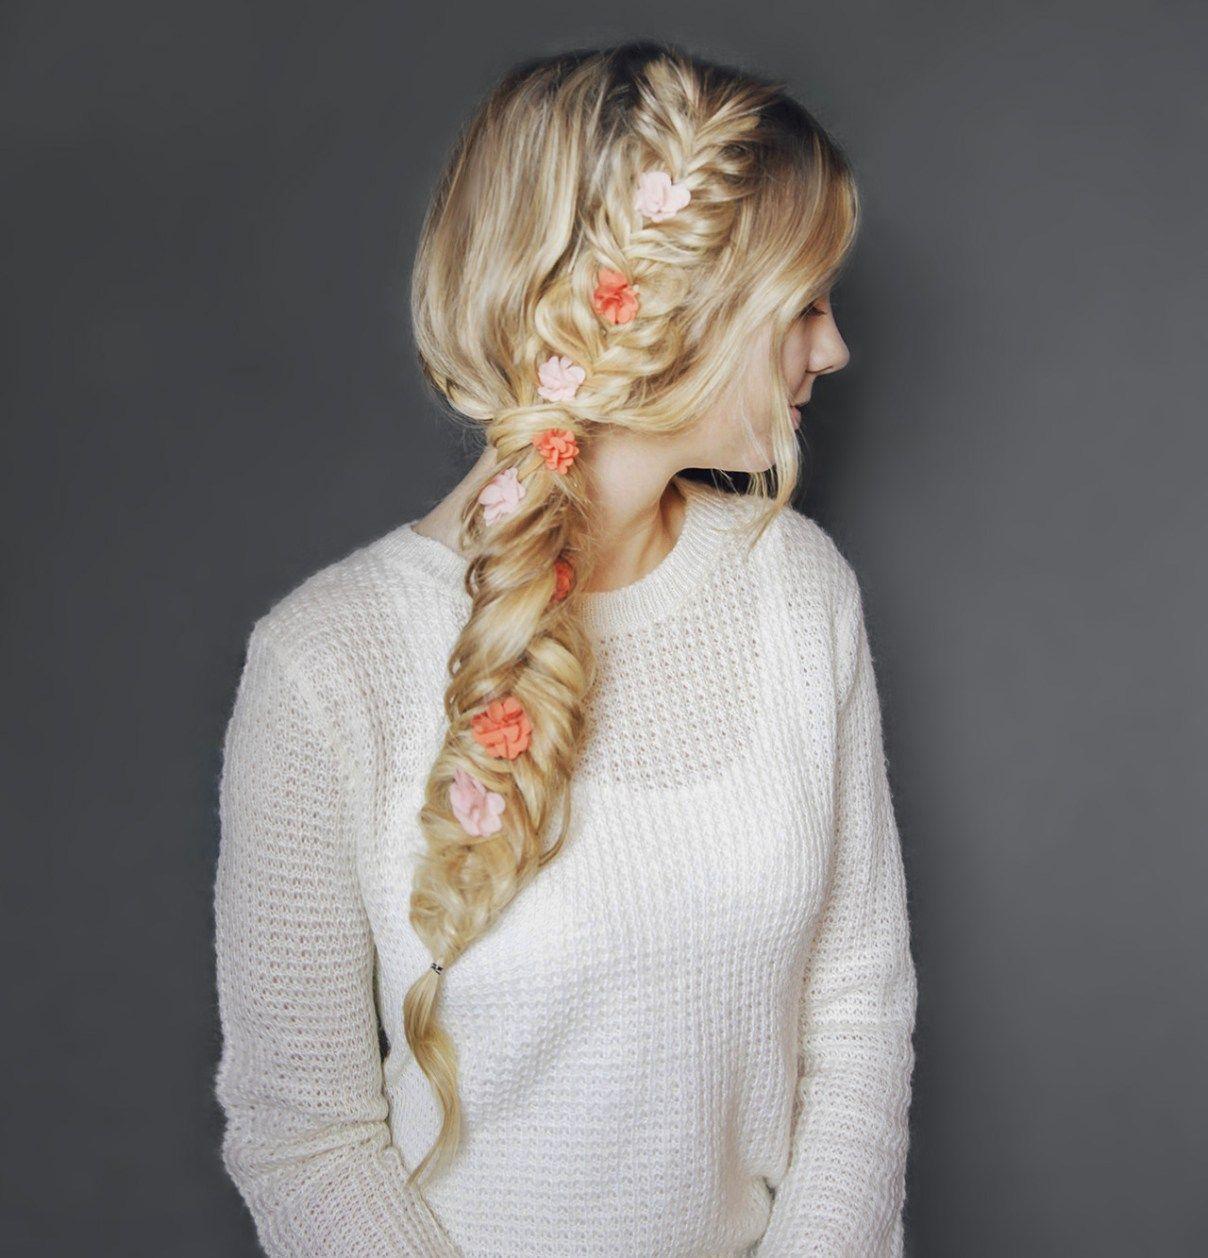 15 GLORIOUS WAYS TO STYLE A FISHTAIL BRAID – My Stylish Zoo  #hairtype #men #women #faceshapes #hairtips #hair #elegant #girls #romantic #kimkardashian #kiss #longhair #fashion #Longhairstyles #weddingBraided # fishtail Braids with bangs # fishtail Braids updo